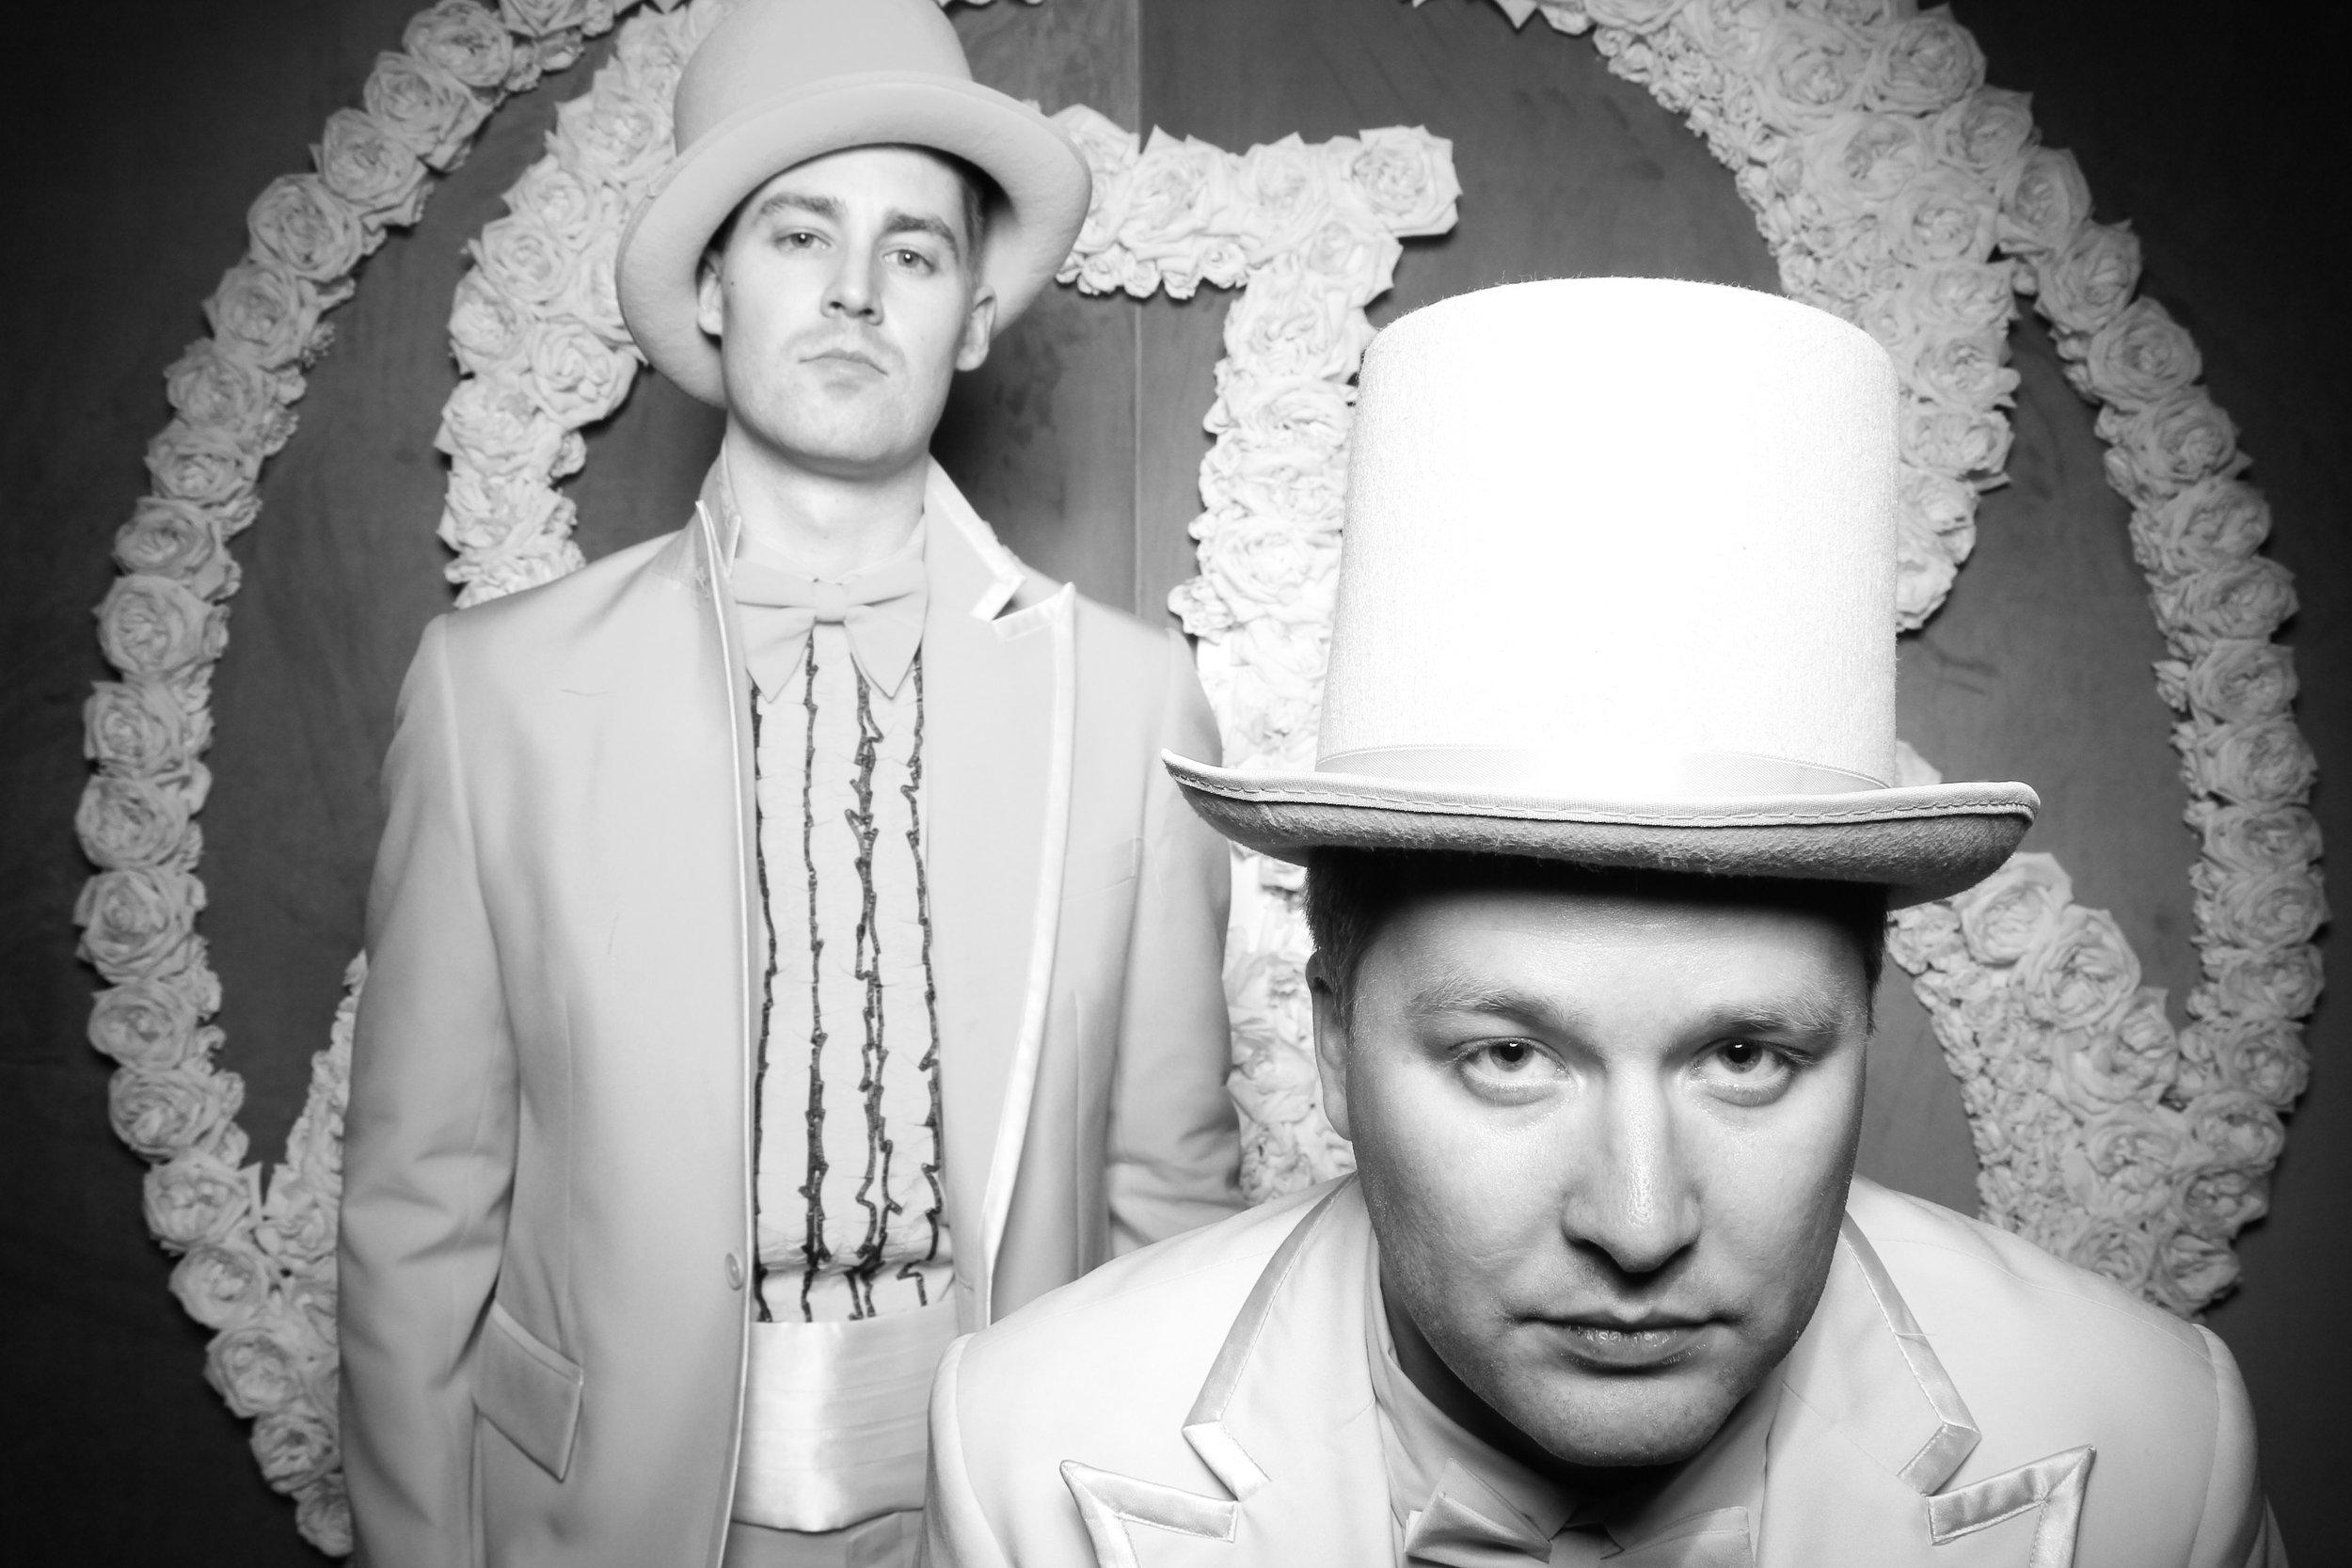 Photo_Booth_Rental_At_Standard_Club_Wedding_Chicago_23.jpg